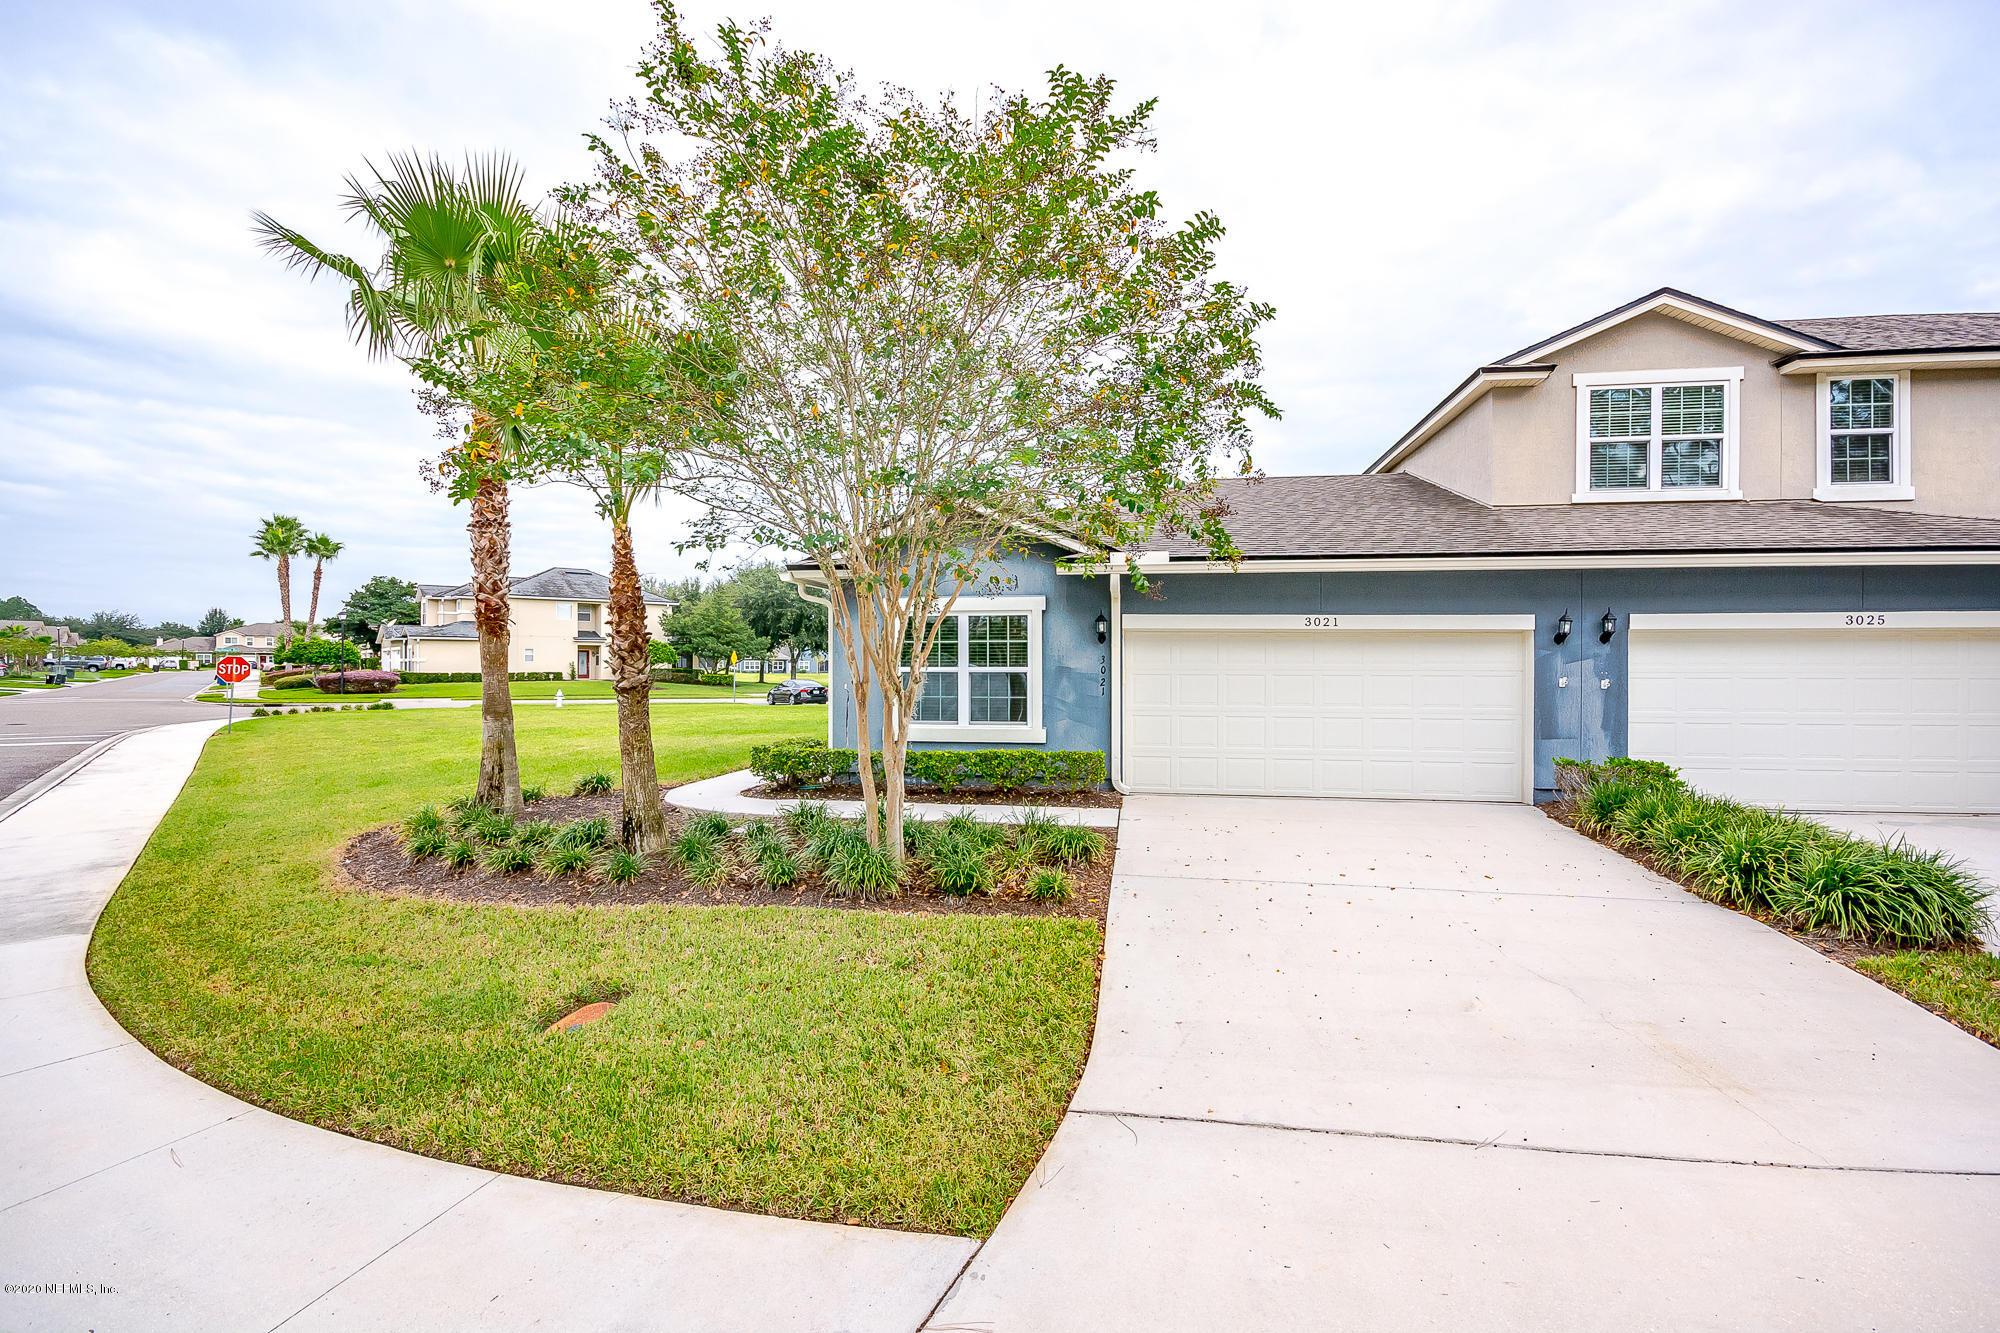 3021 CHESTNUT RIDGE, ORANGE PARK, FLORIDA 32065, 3 Bedrooms Bedrooms, ,2 BathroomsBathrooms,Residential,For sale,CHESTNUT RIDGE,1077666